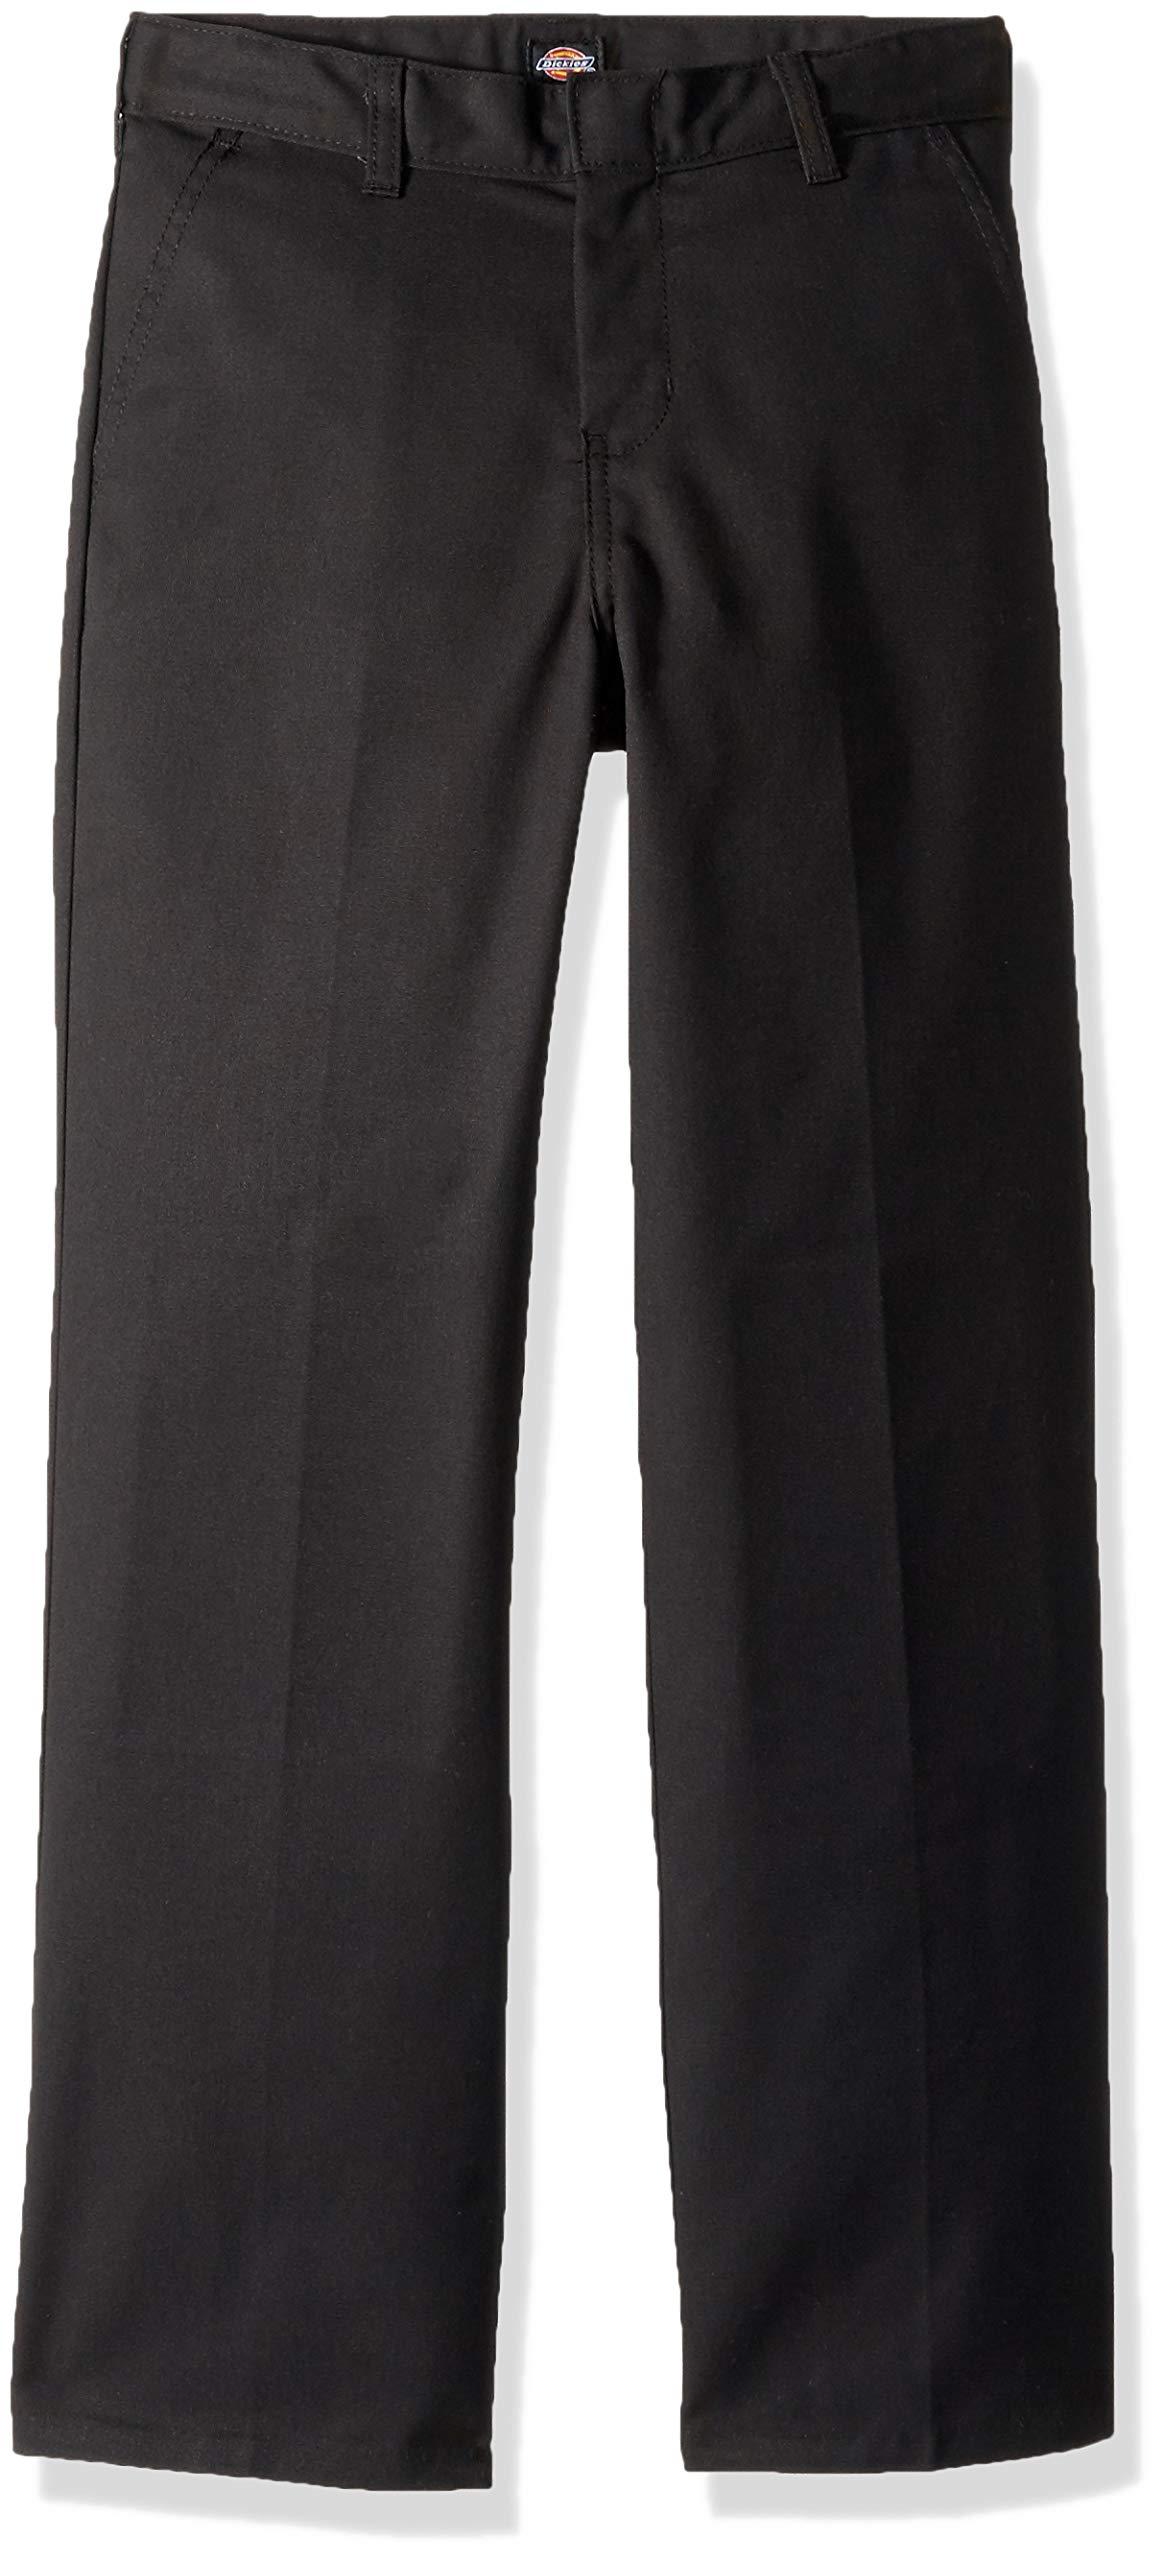 Dickies Kids Boys' Big Flexwaist Flat Front Straight Leg Pant, Black, 8 by Dickies Kids